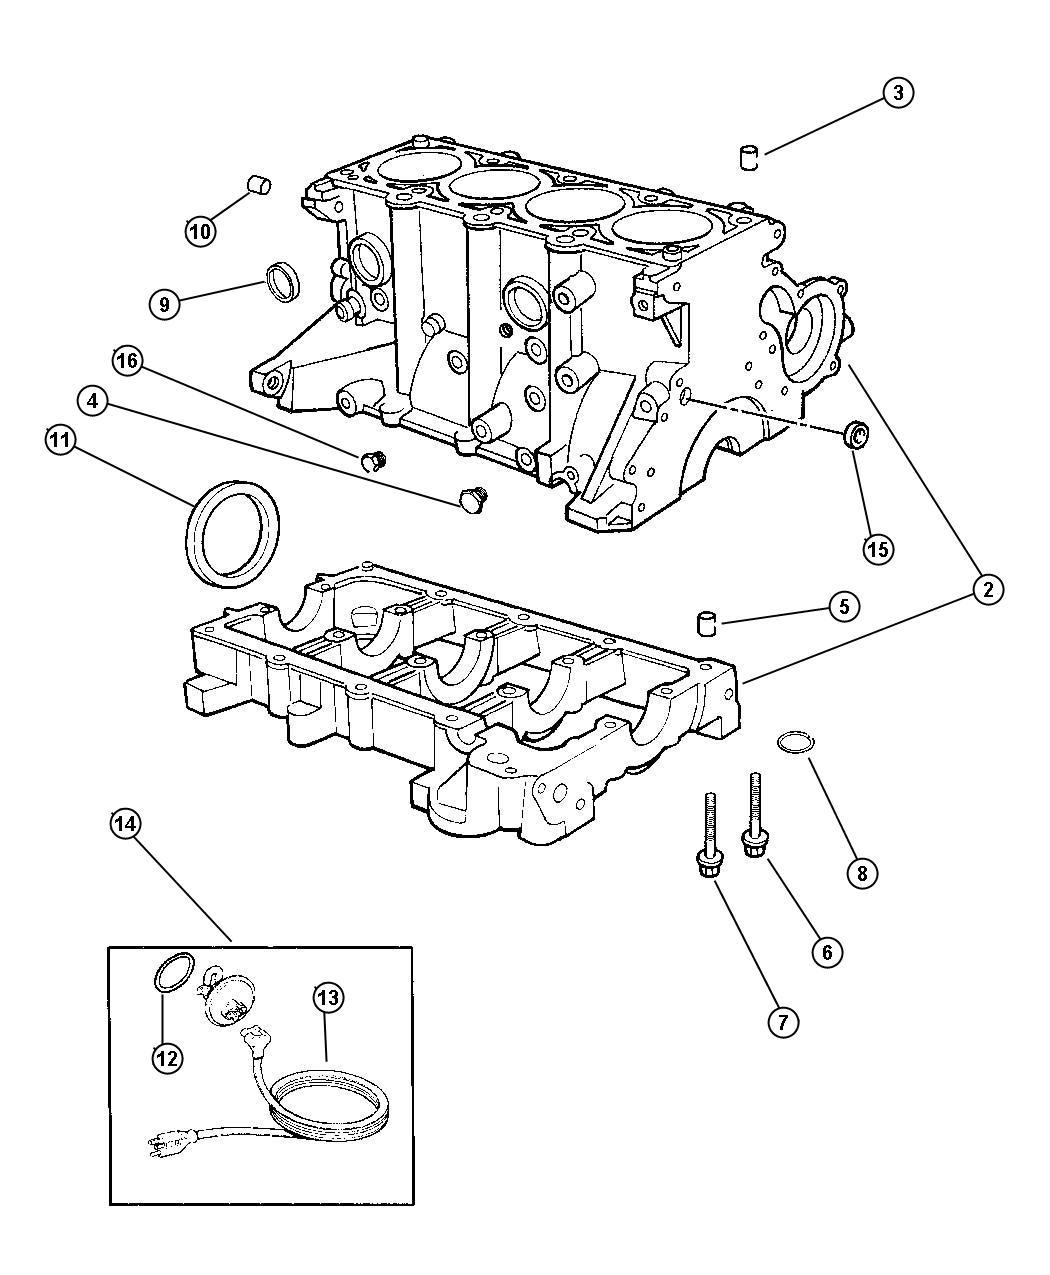 Dodge Stratus Gasket Package Engine Lower Emissions